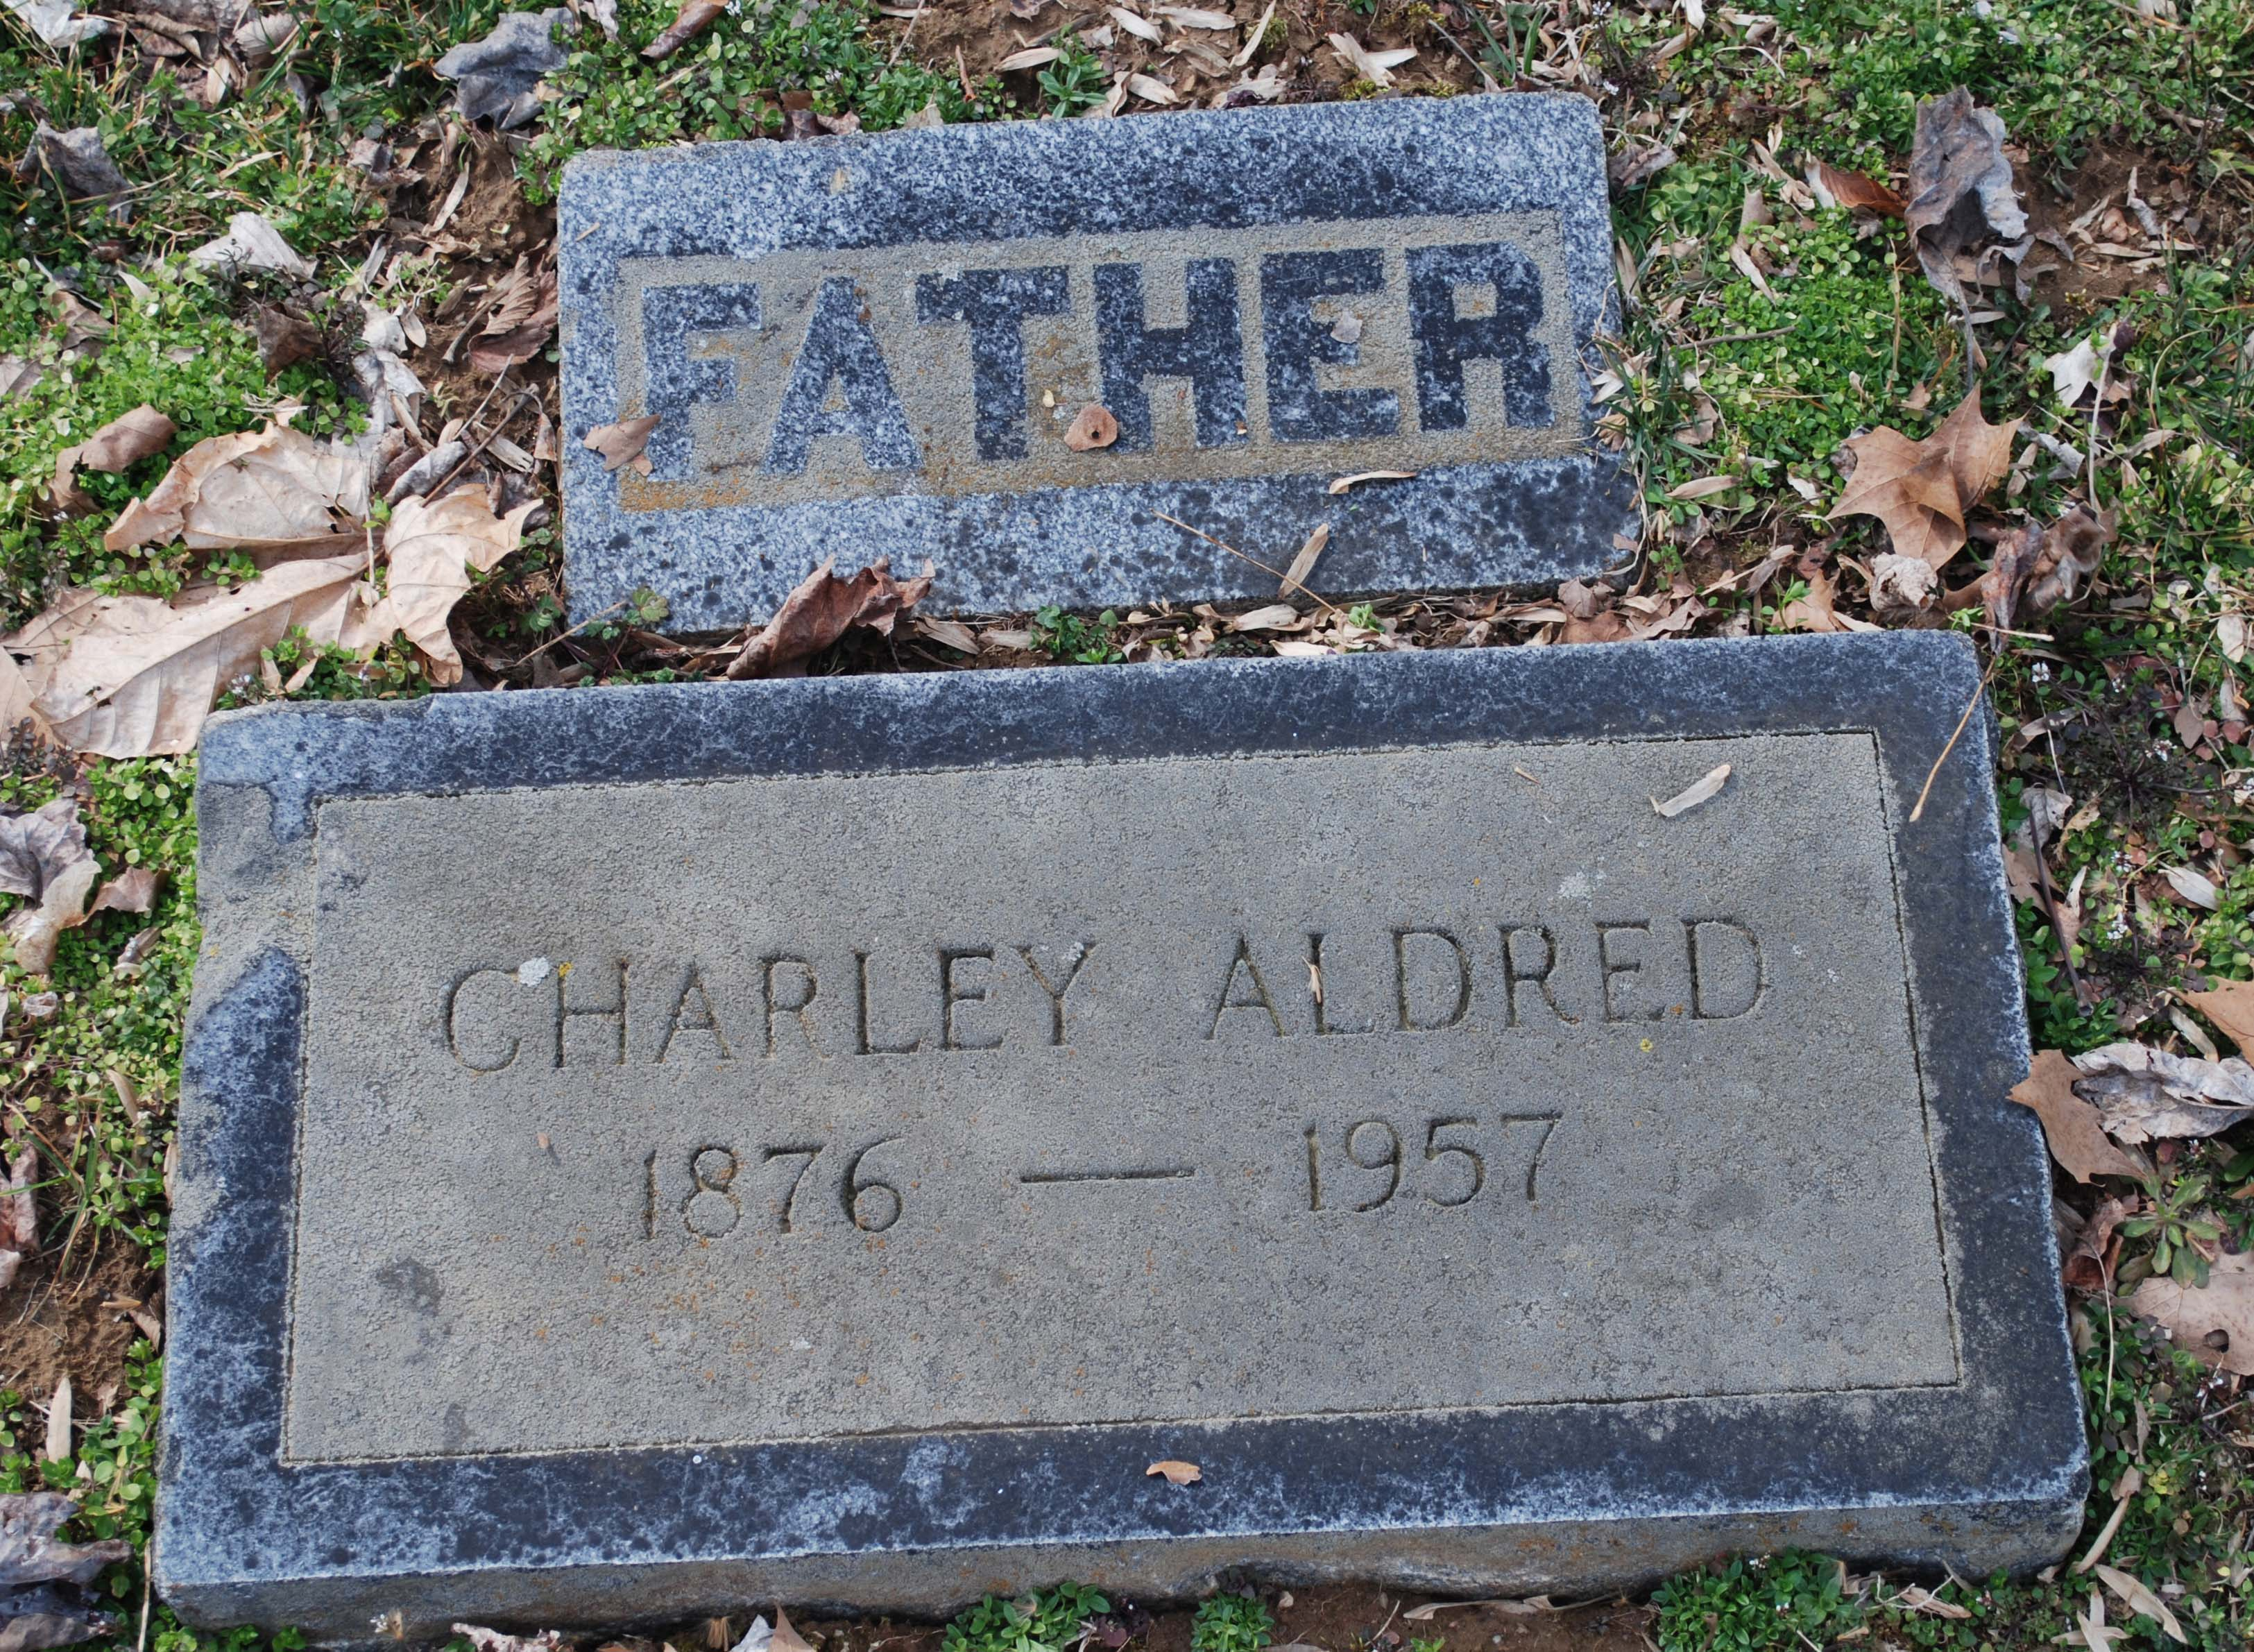 Charles E. Charley Aldred